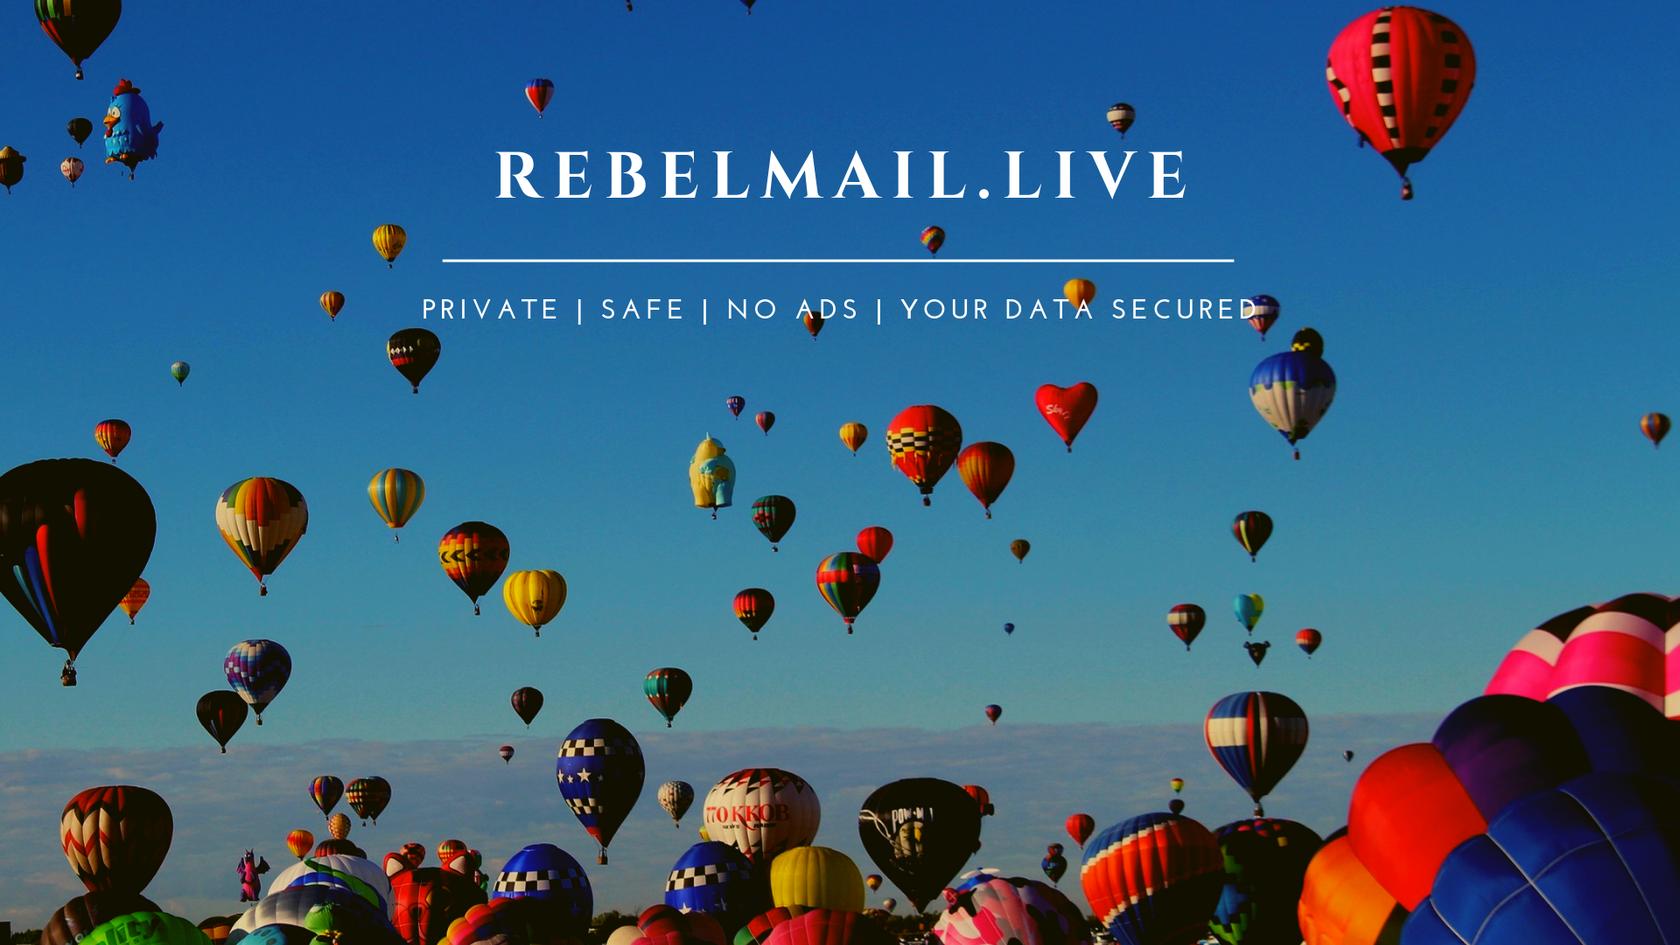 REBELMAIL.LIVE